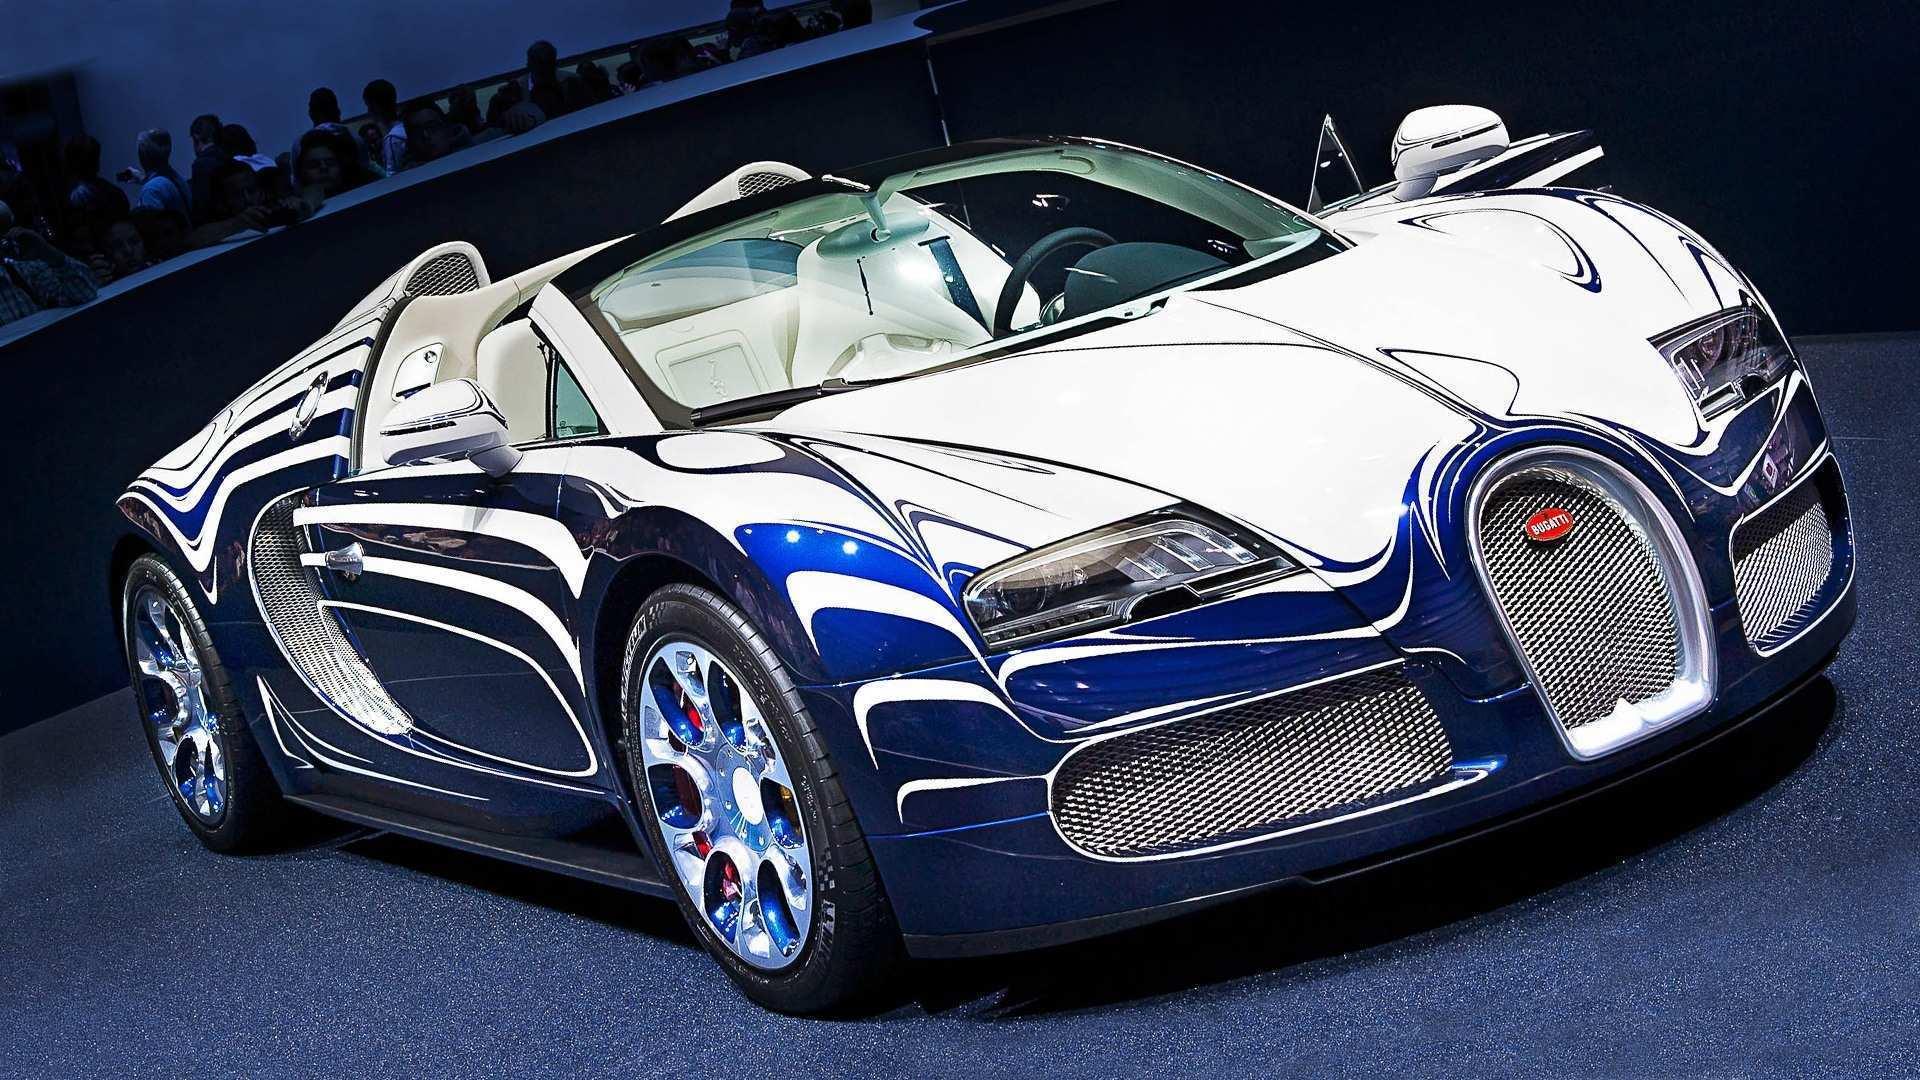 20 Concept of 2019 Bugatti Veyron Rumors by 2019 Bugatti Veyron